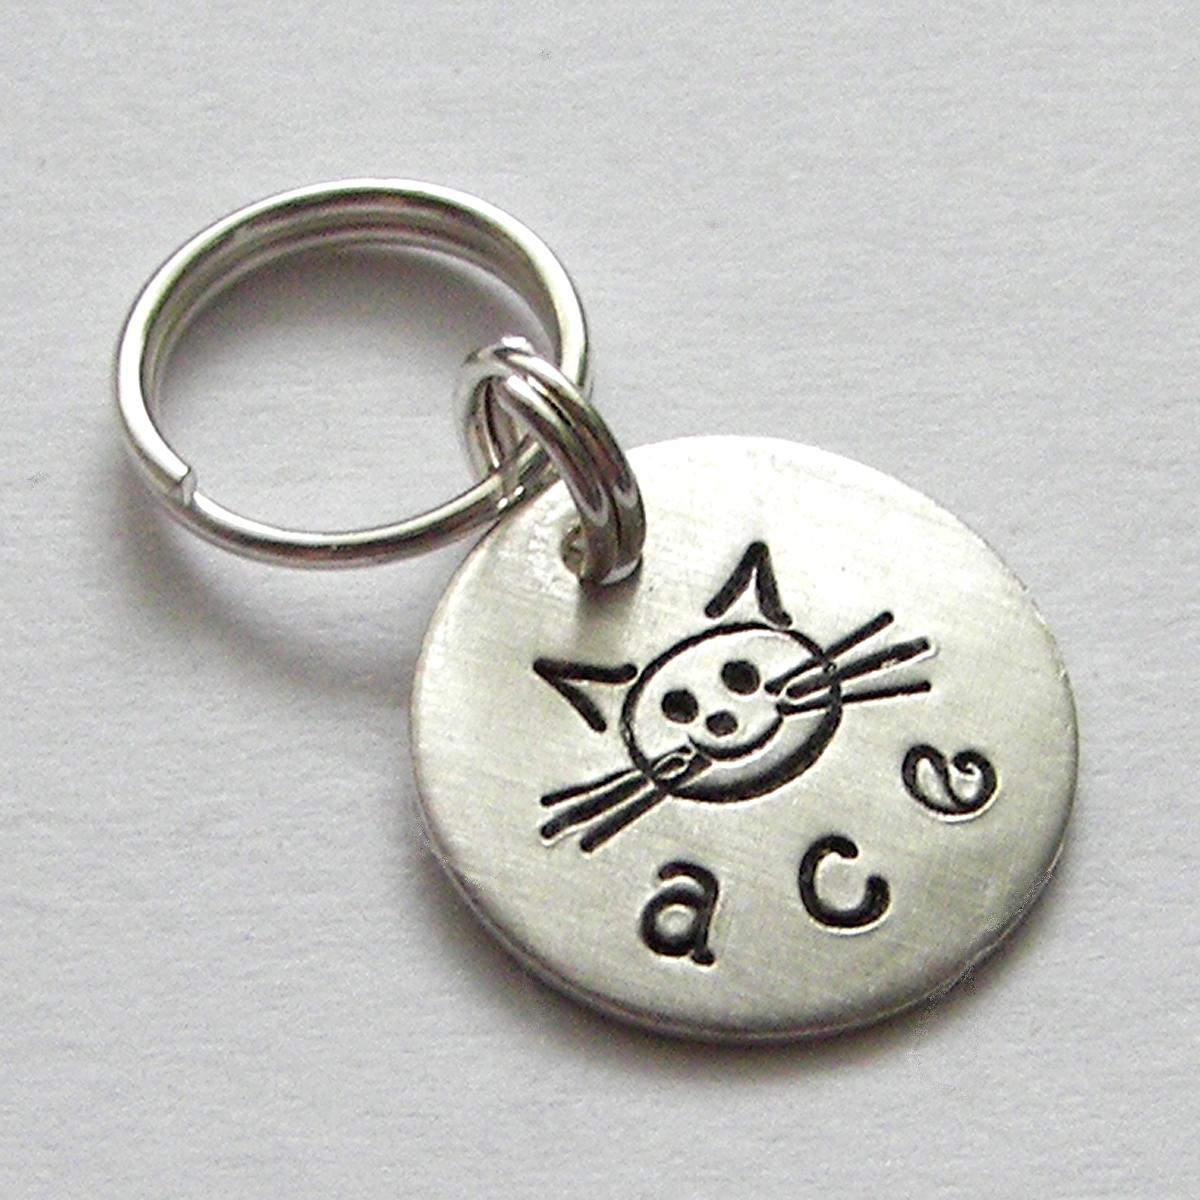 My Itty Bitty Kitty Personalized Pet Tag